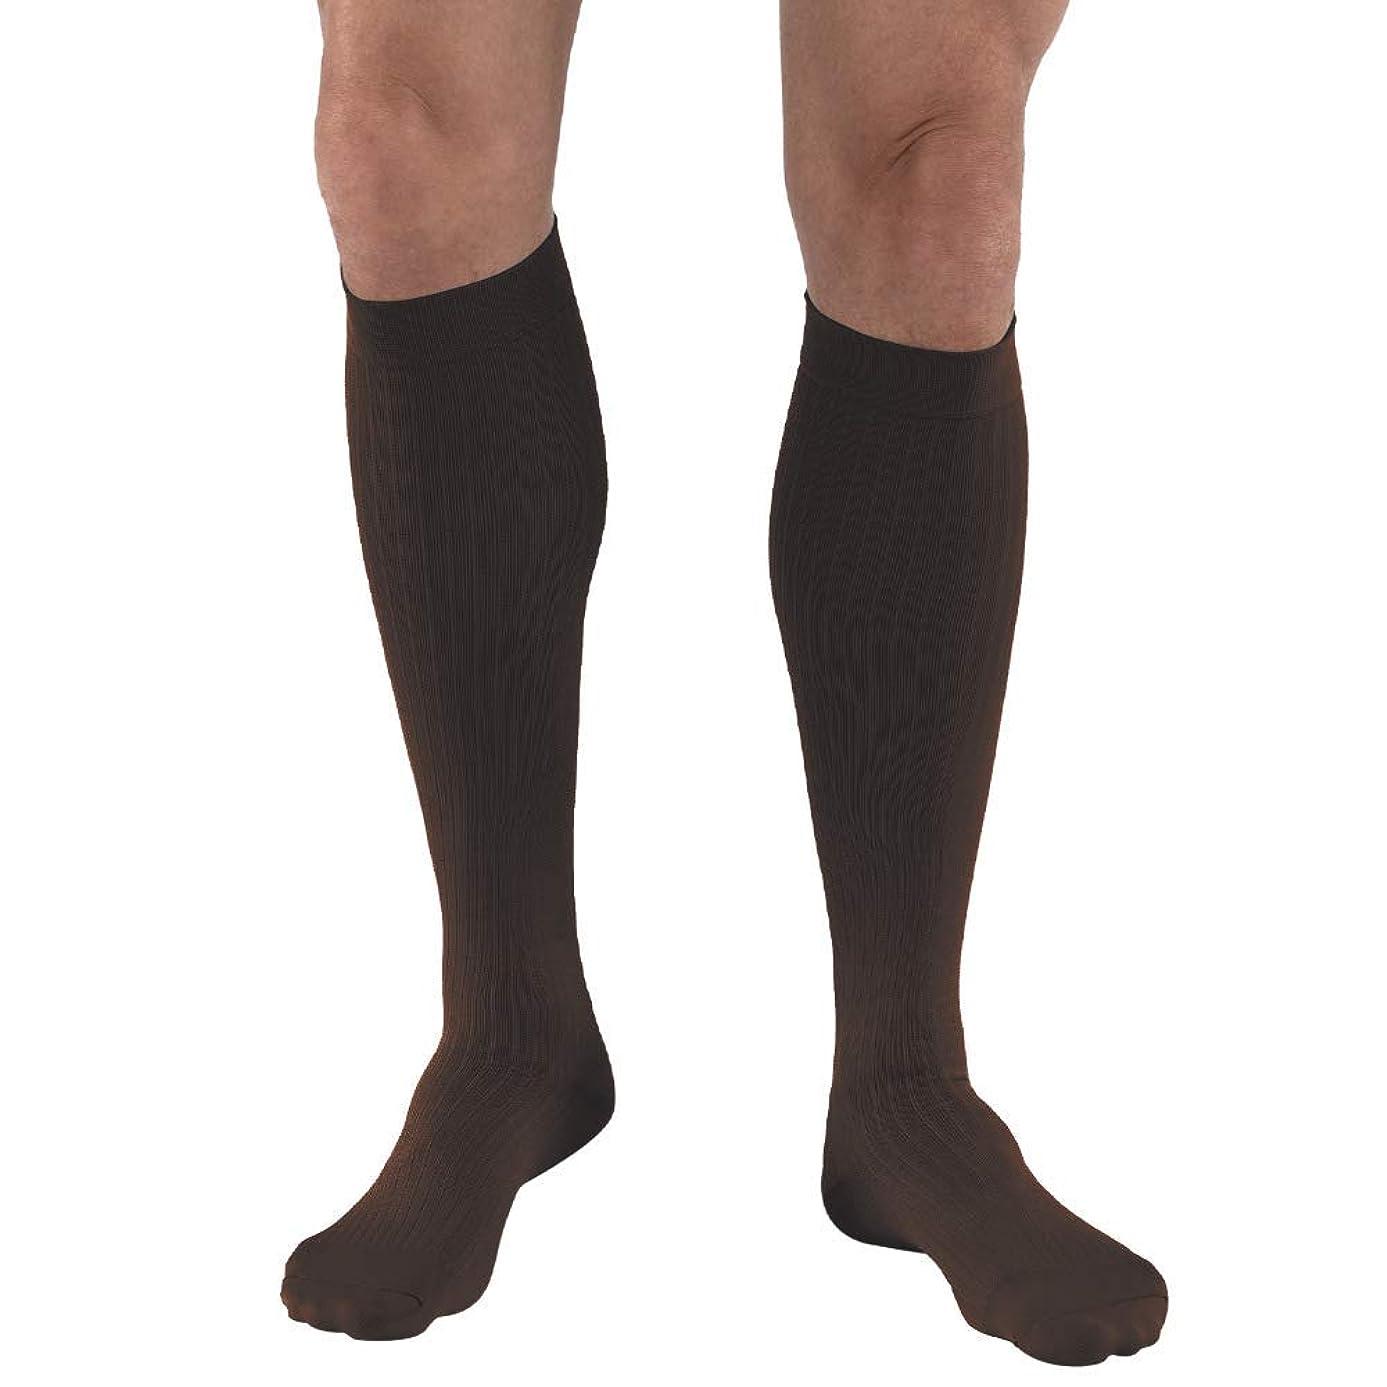 JOBST Men's Dress Knee High 8-15 Closed Toe Socks, Brown, Large